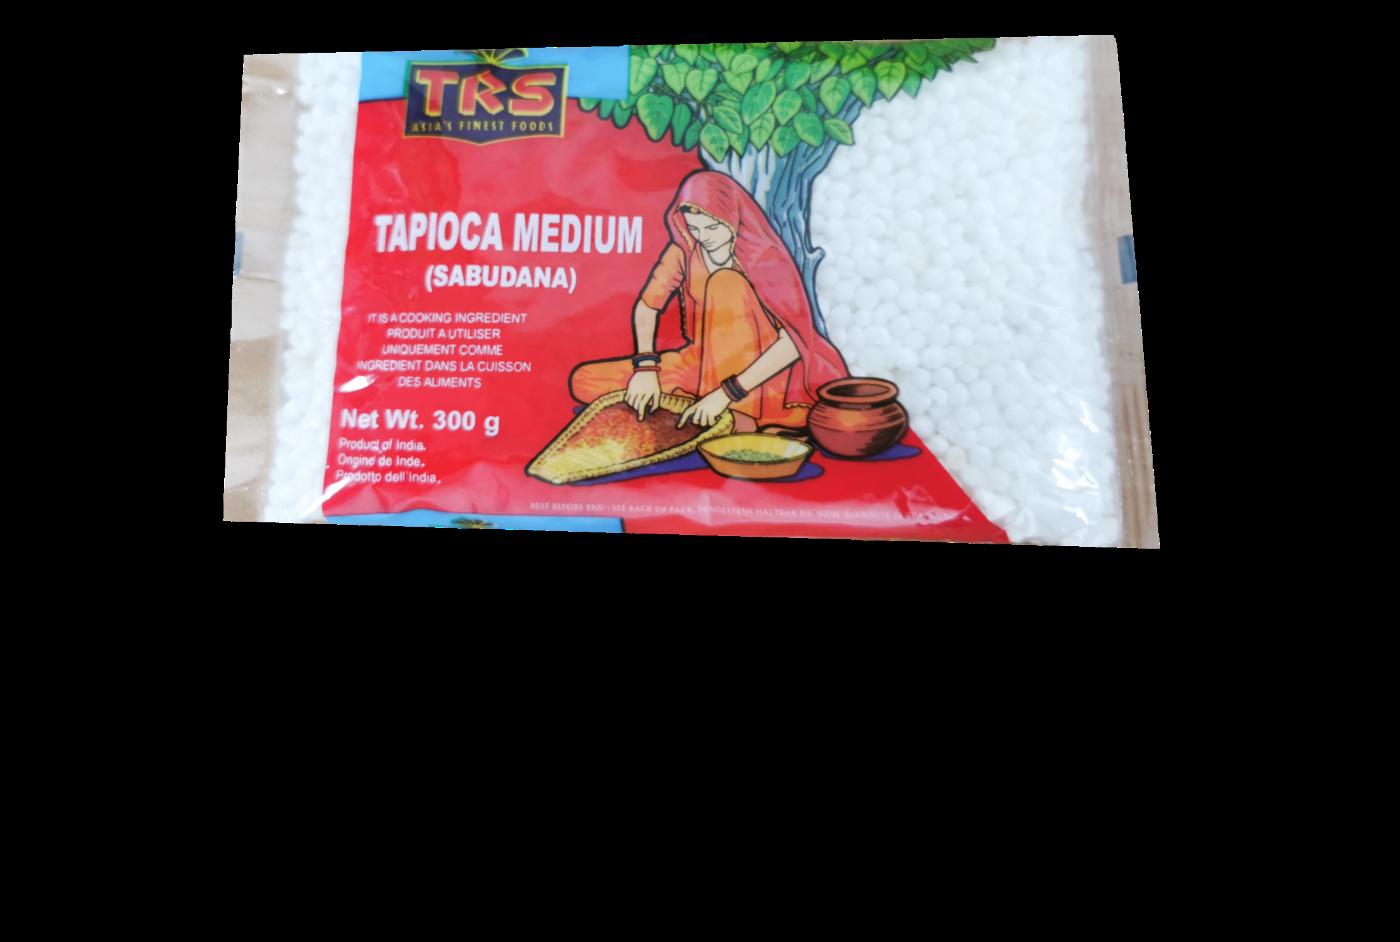 TRA Tapioca Medium (Sabudana)